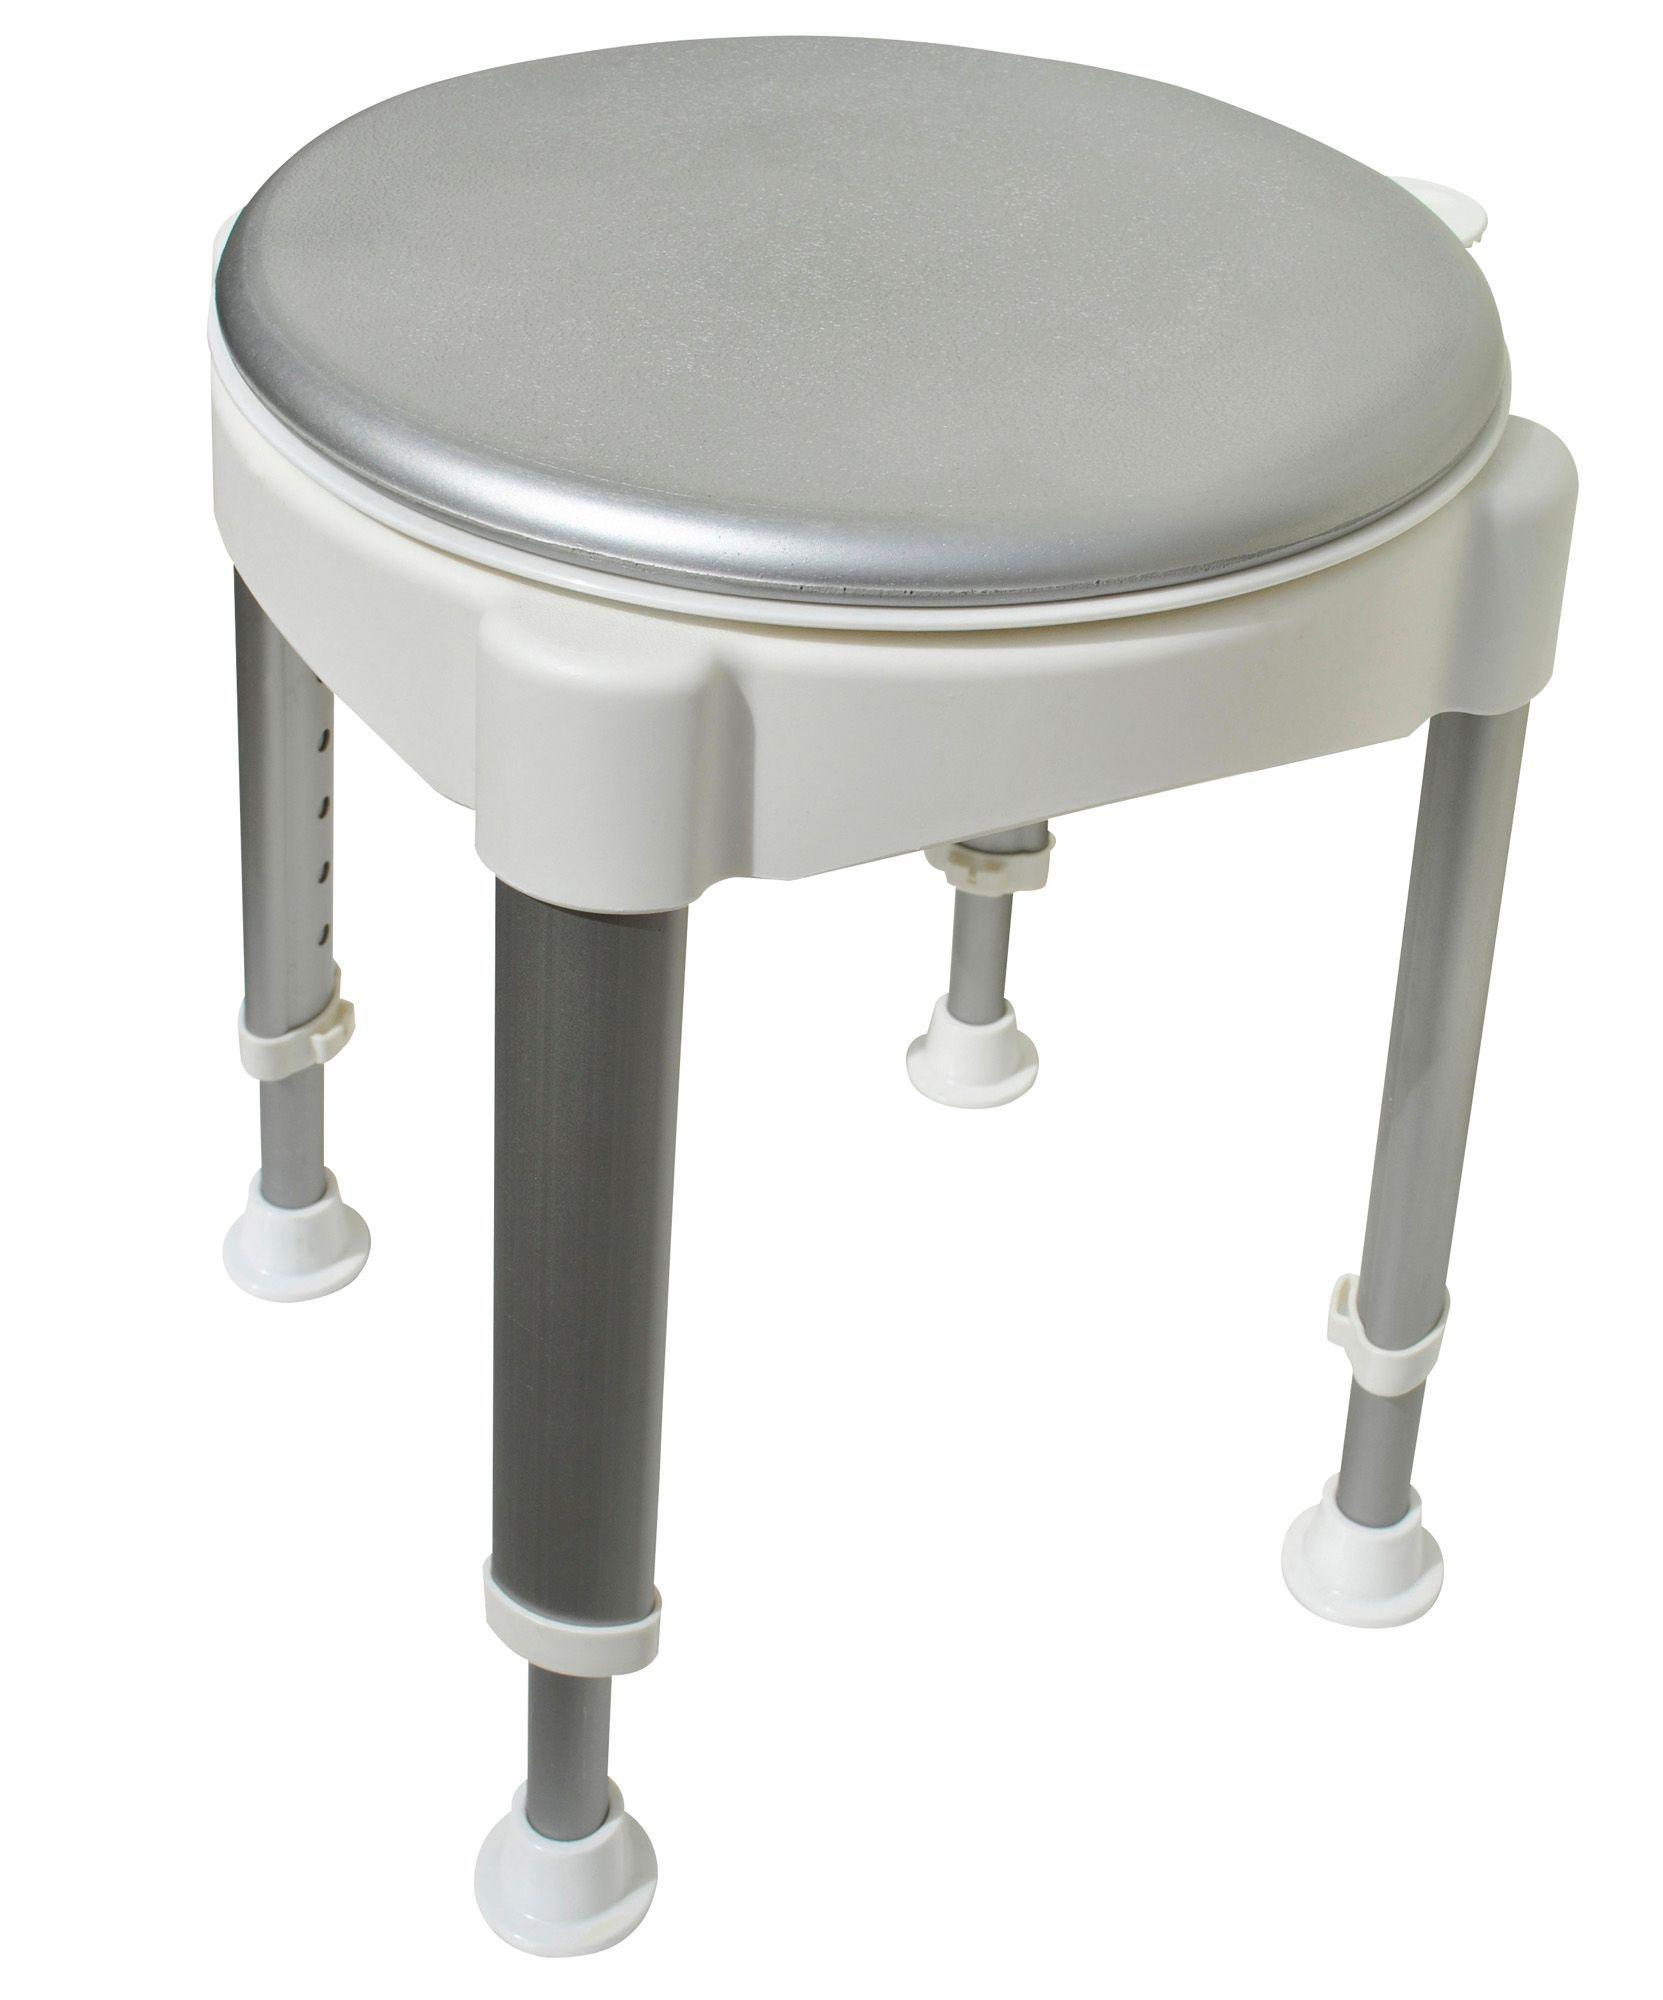 bar stool assembly instructions